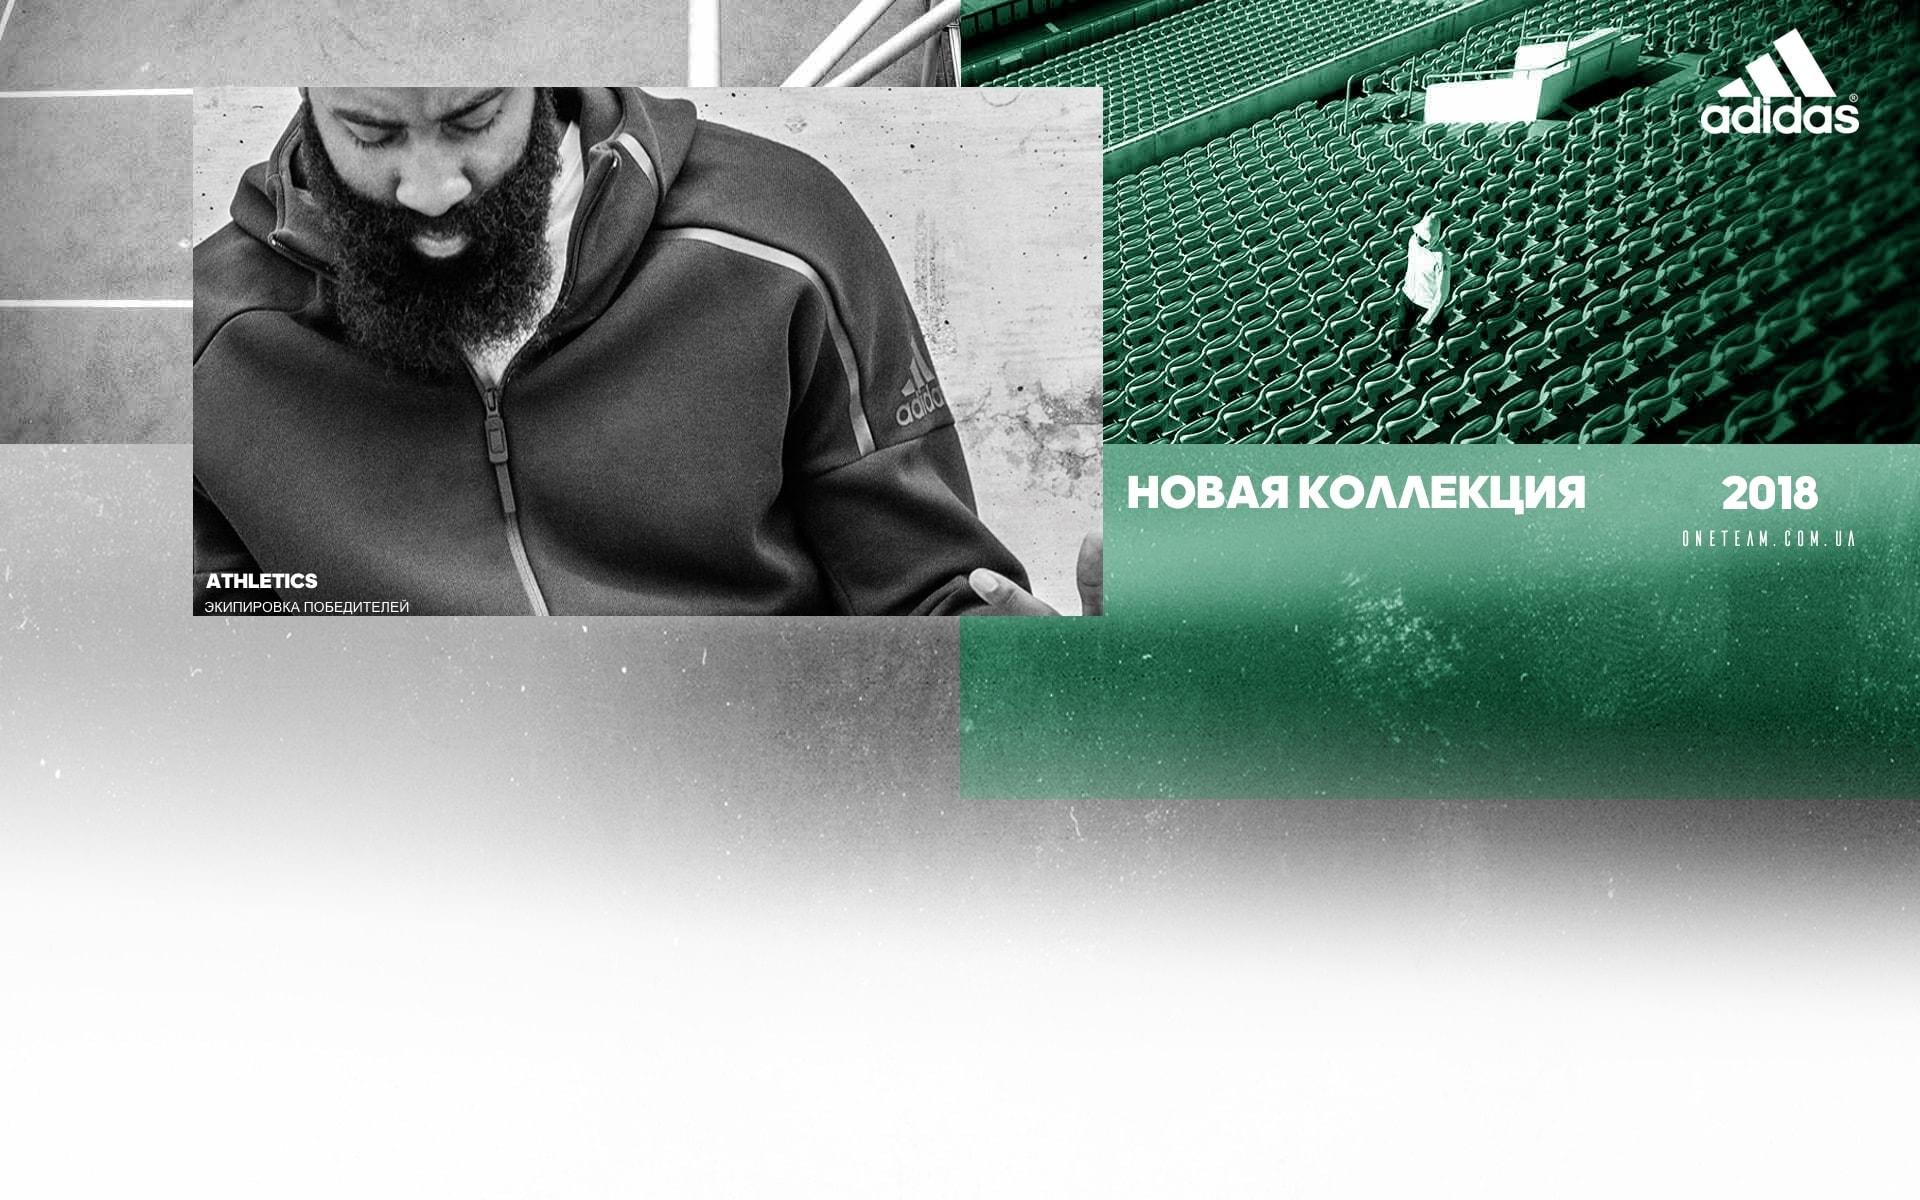 adidas_internet_magazin-min.jpg